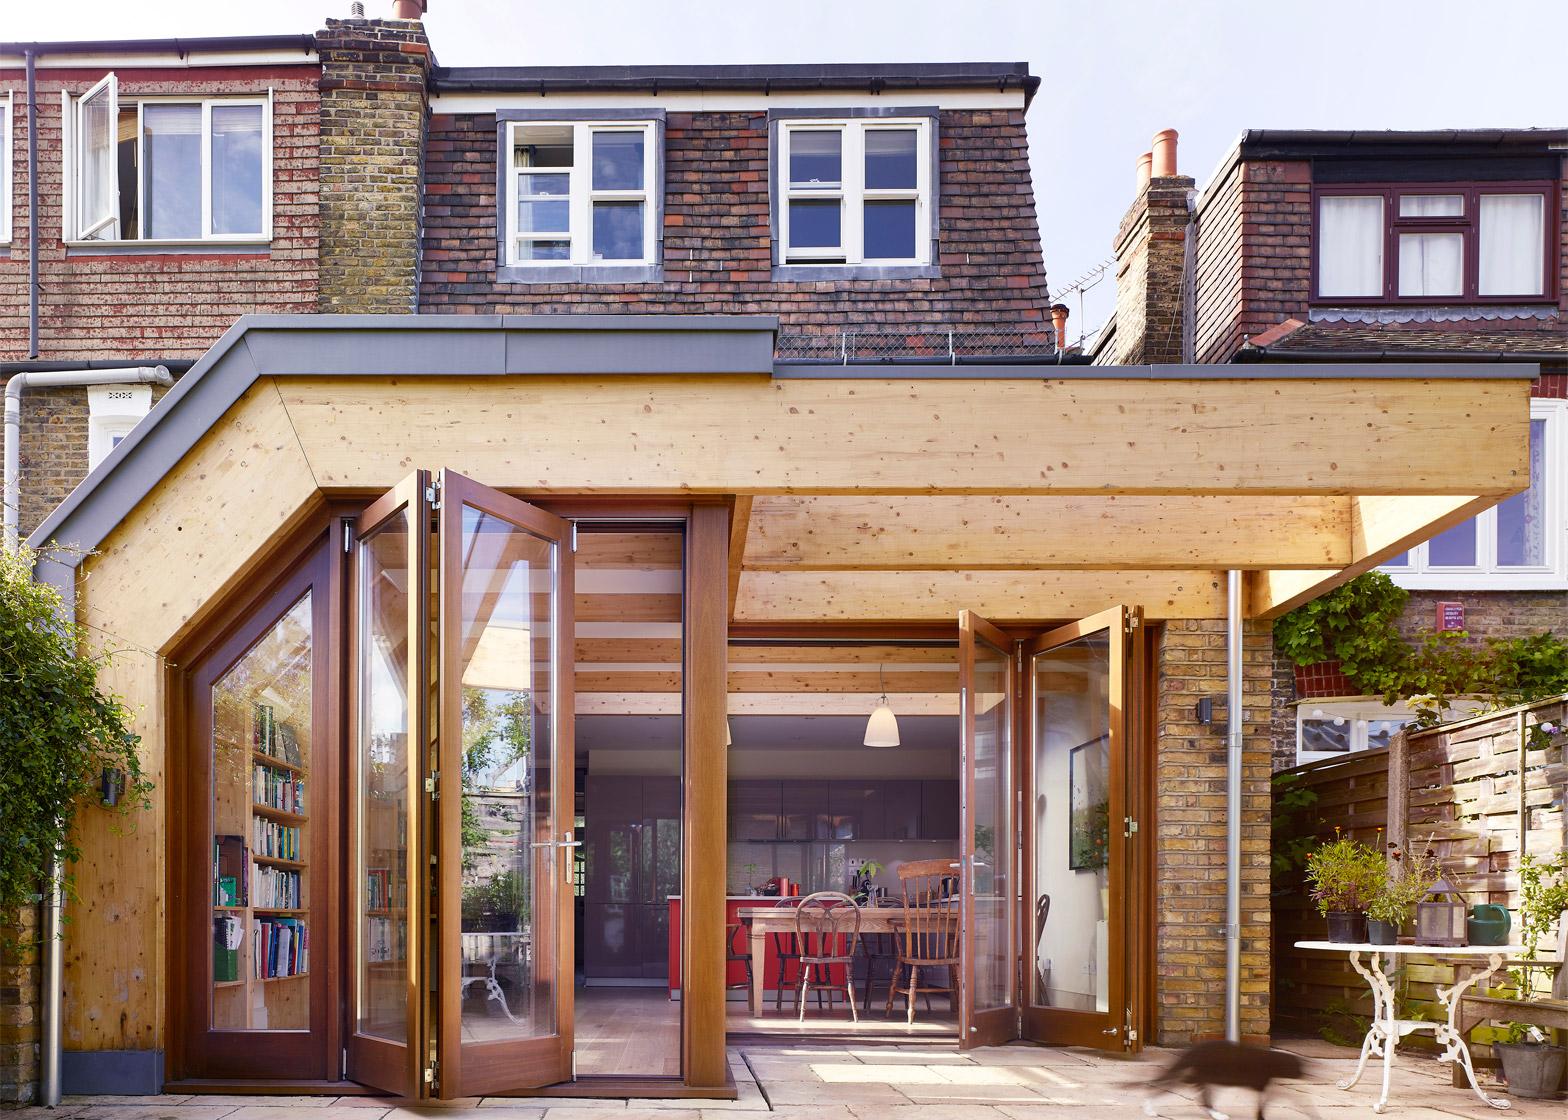 Timber exoskeleton house by Tate Harmer